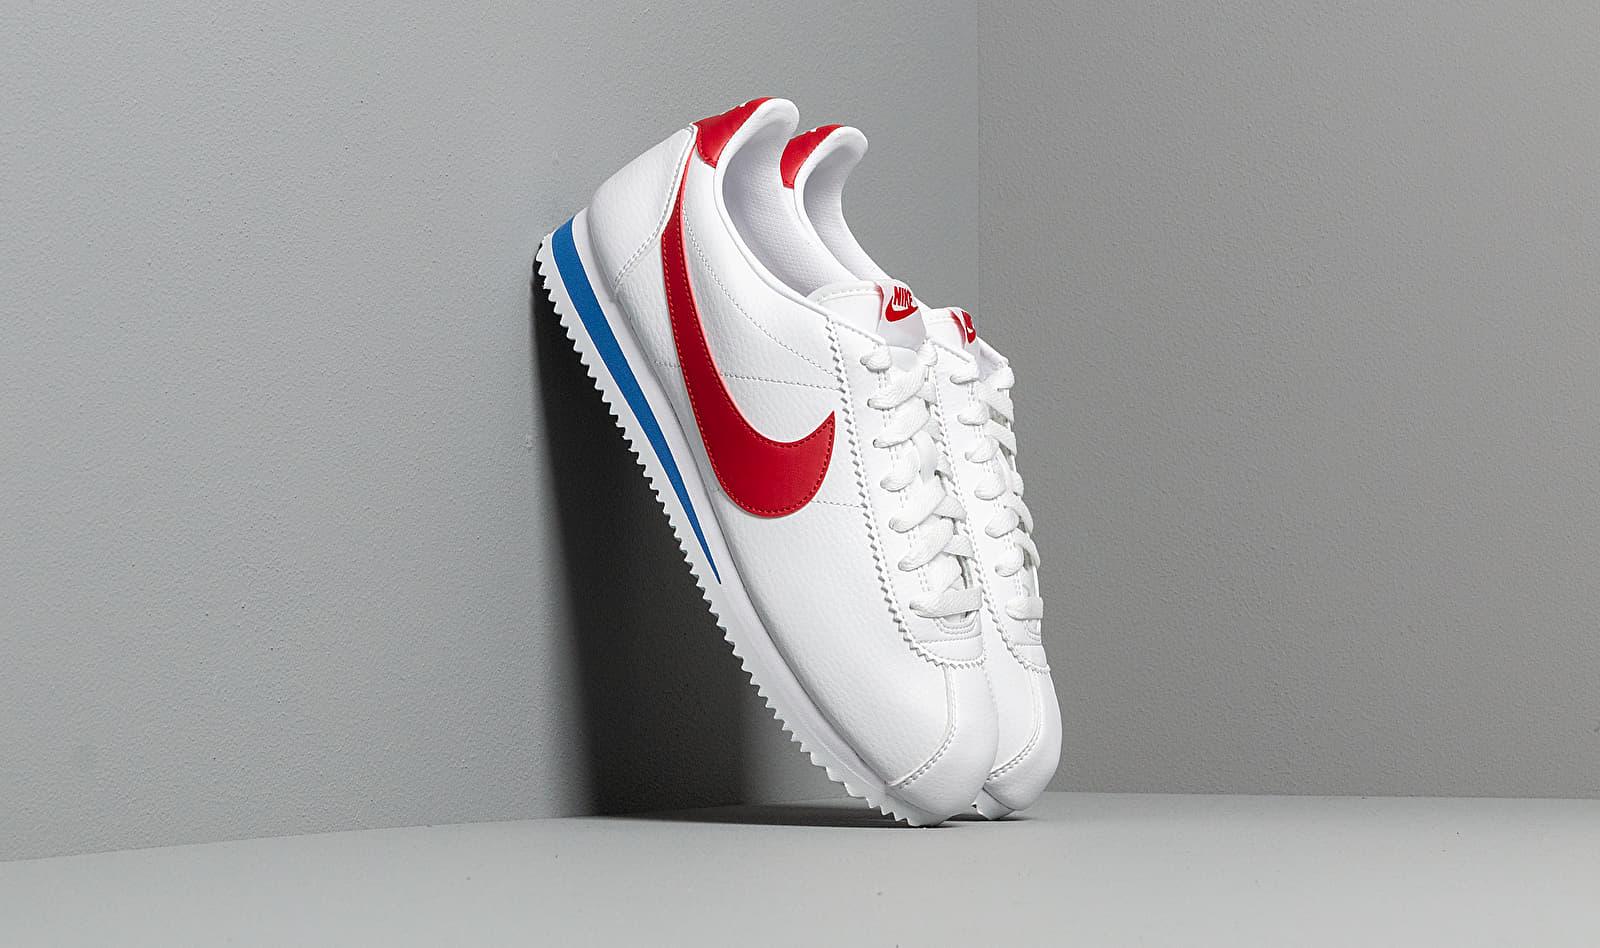 Nike Classic Cortez Leather White/ Varsity Red-Varsity Royal 749571-154